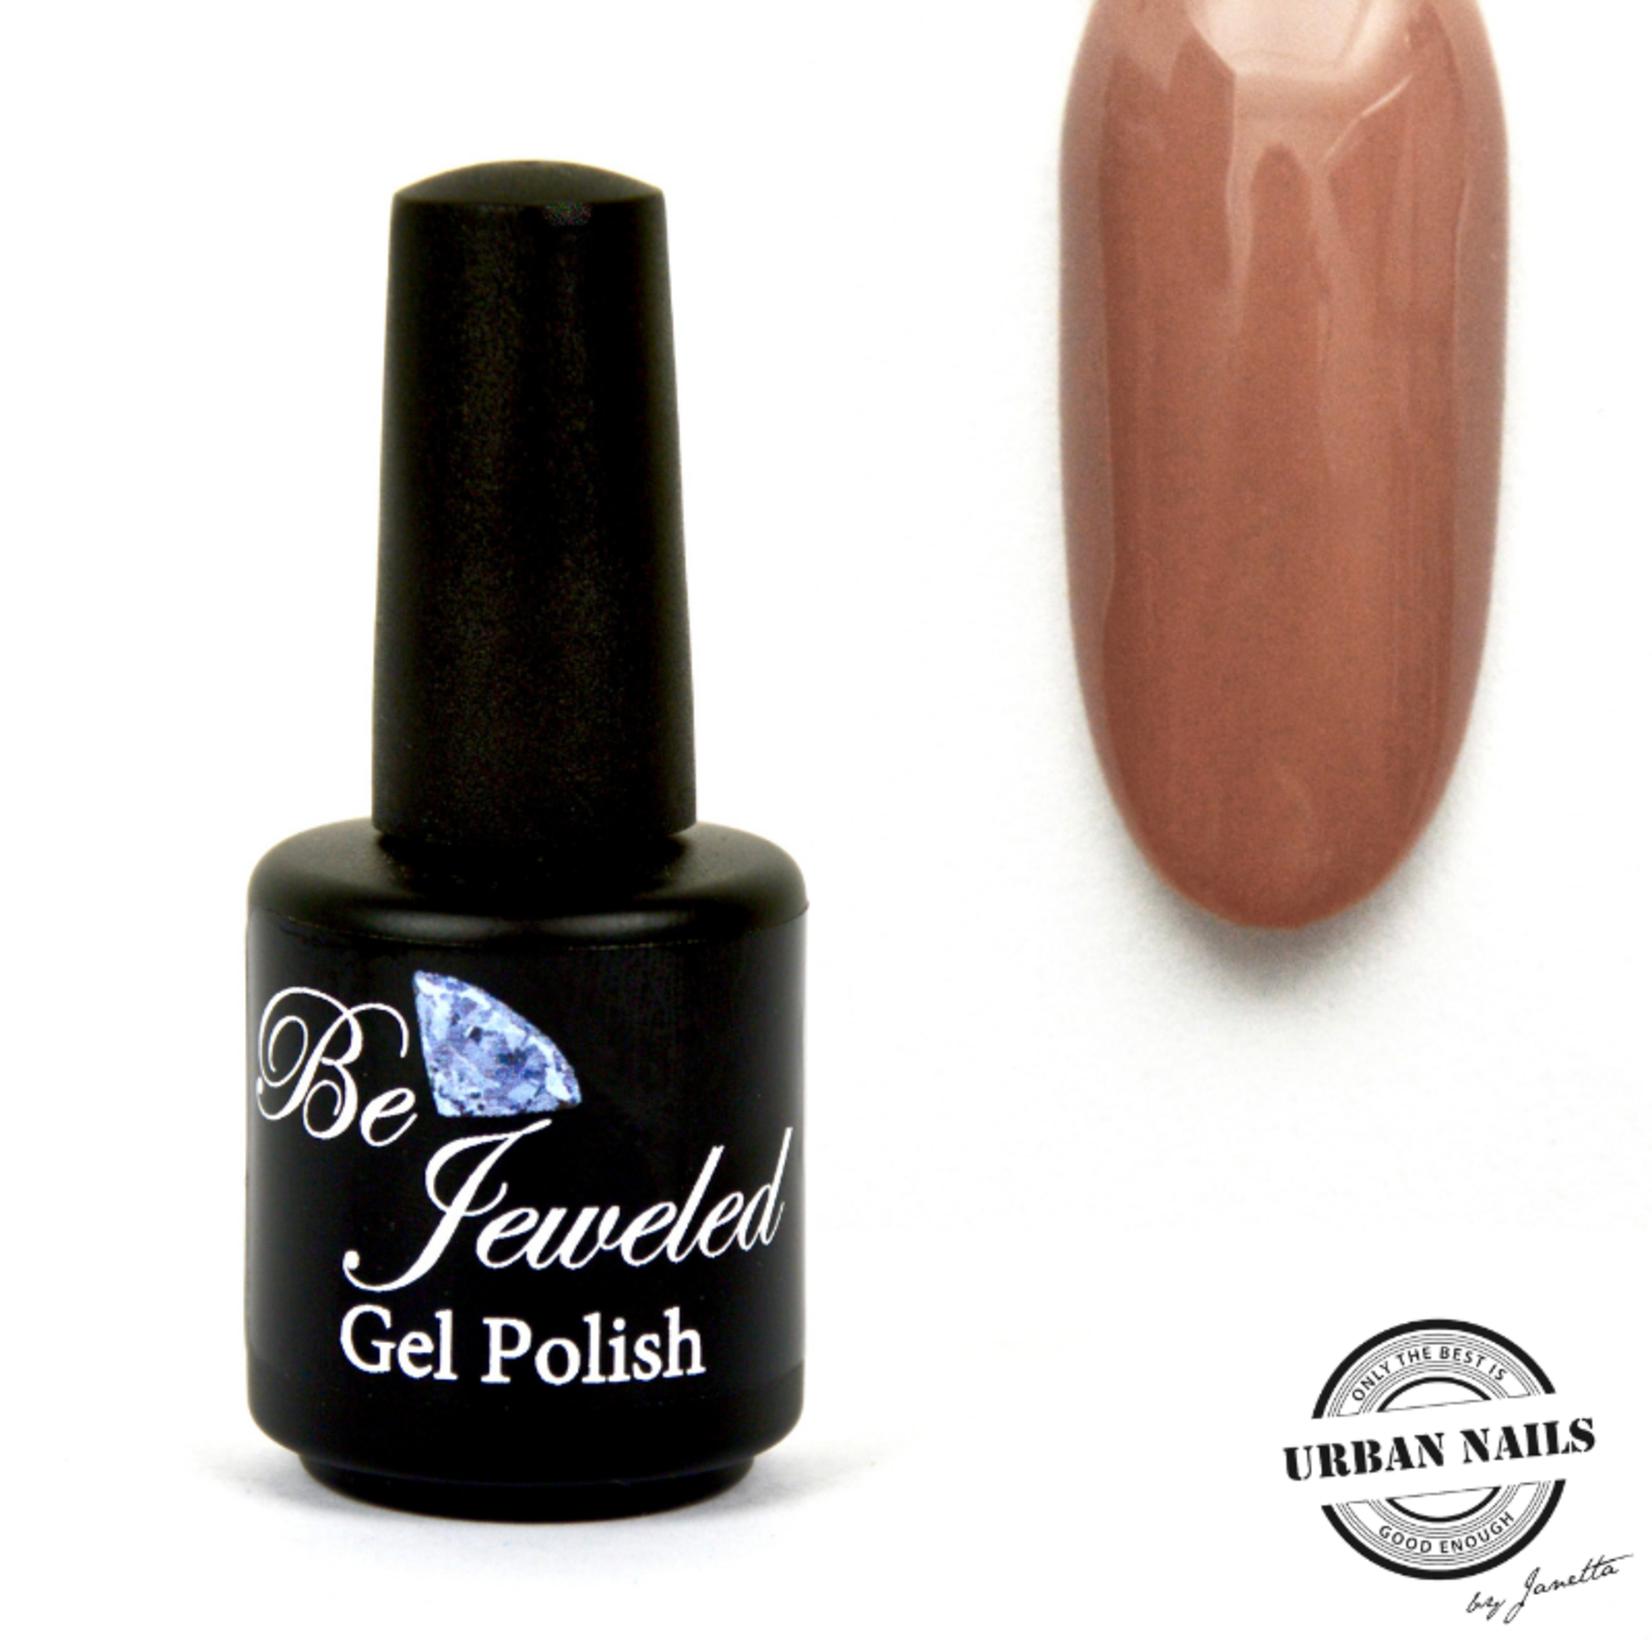 Urban Nails Be Jeweled Gelpolish 08 Nude Caramel